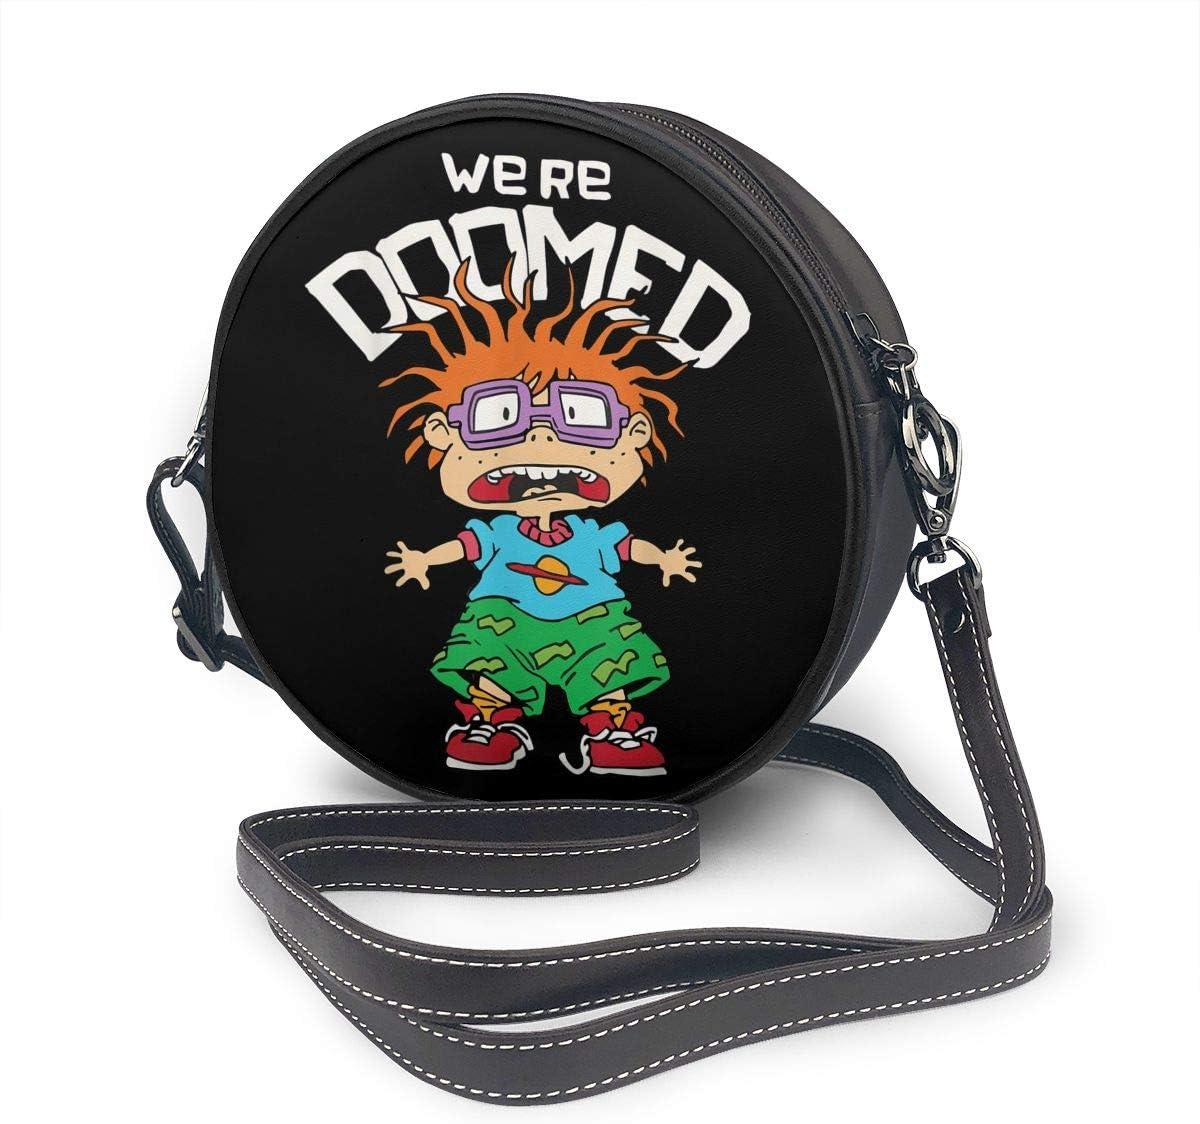 Duwamesva Rugrats Tommy Small Crossbody Bags Shoulder Bag Purse and Handbags Womans